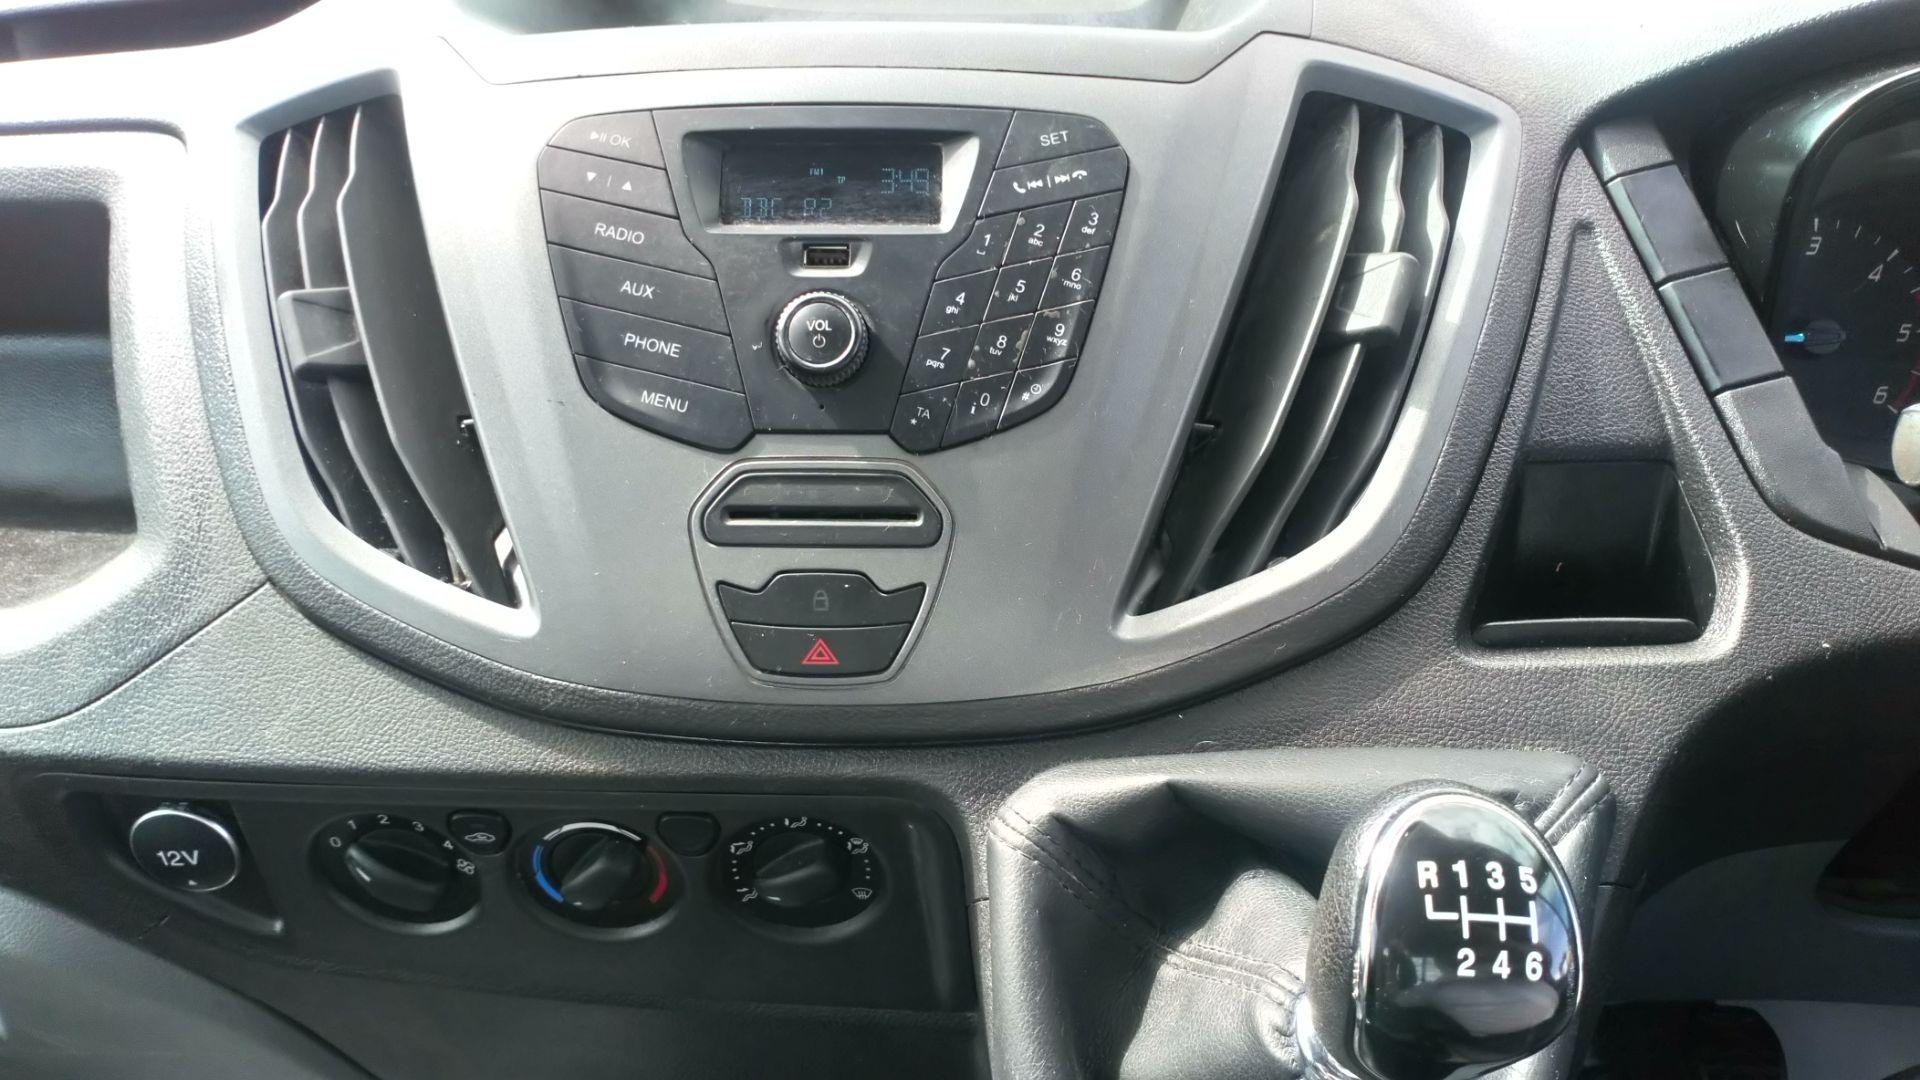 2015 Ford Transit 2.2 Tdci 125Ps Single Cab Cab Tipper (FH65DVA) Image 16